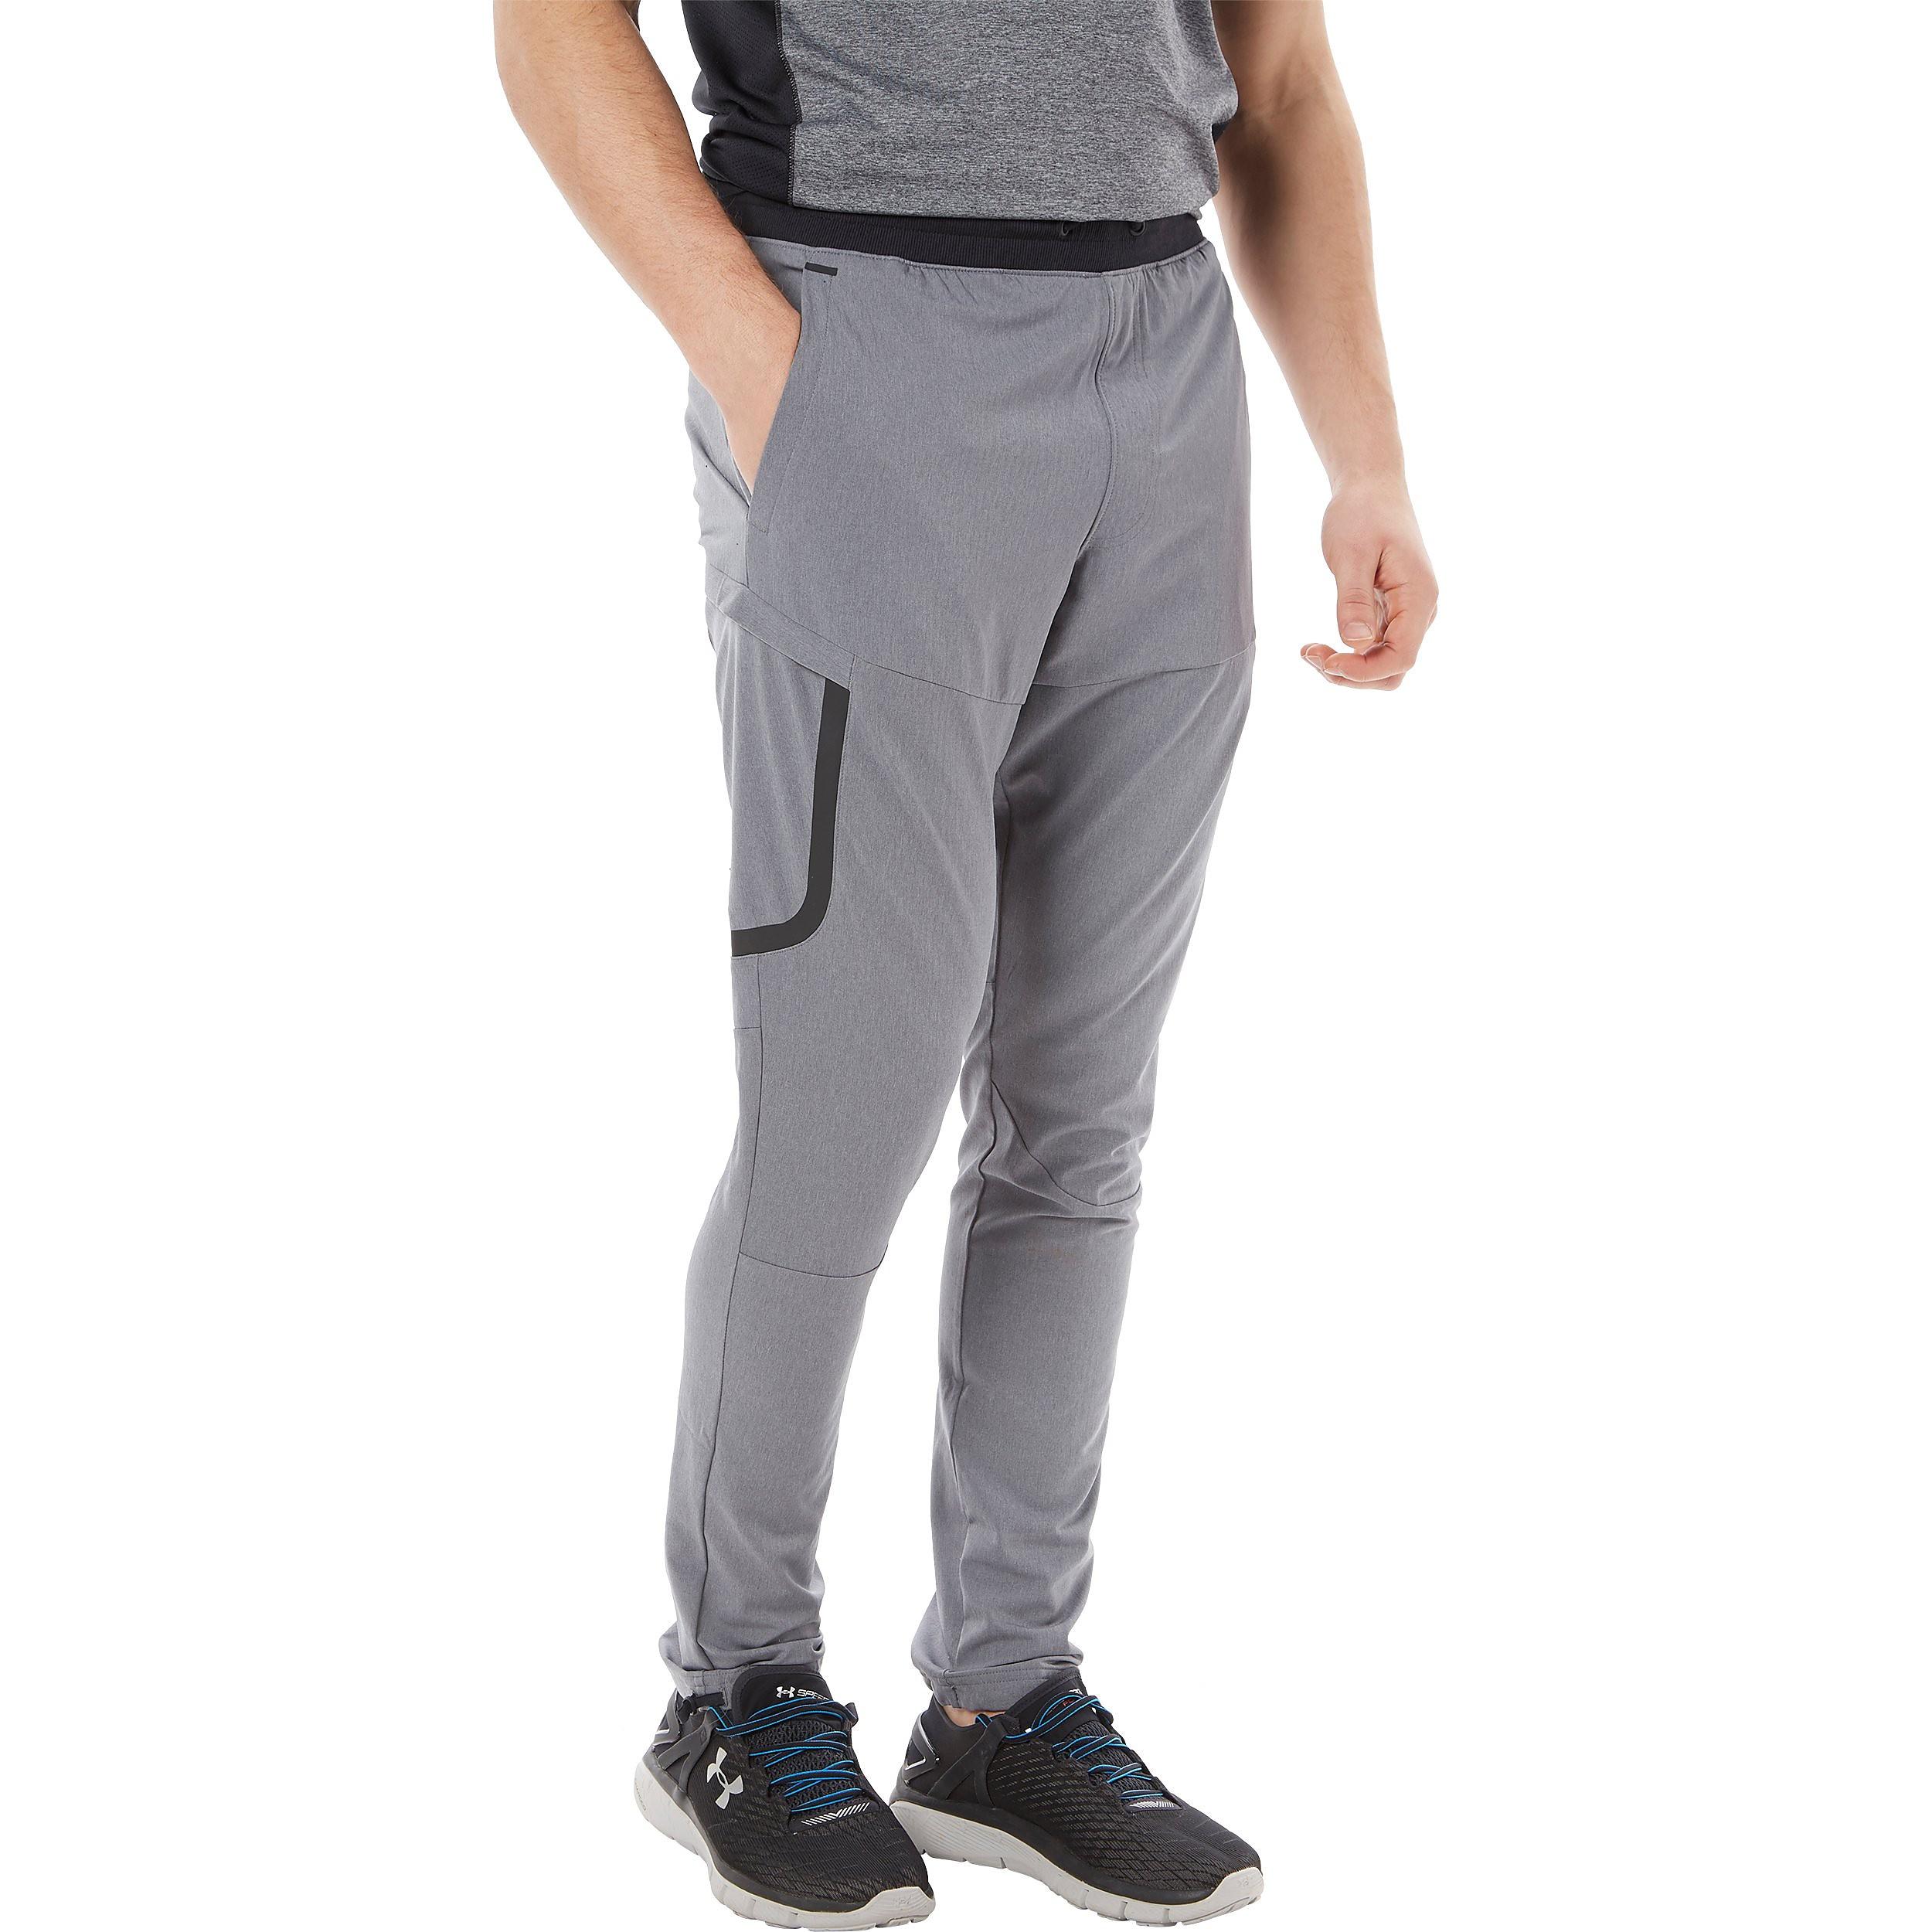 Under Armour Sportstyle Elite Cargo Men's Training Trousers